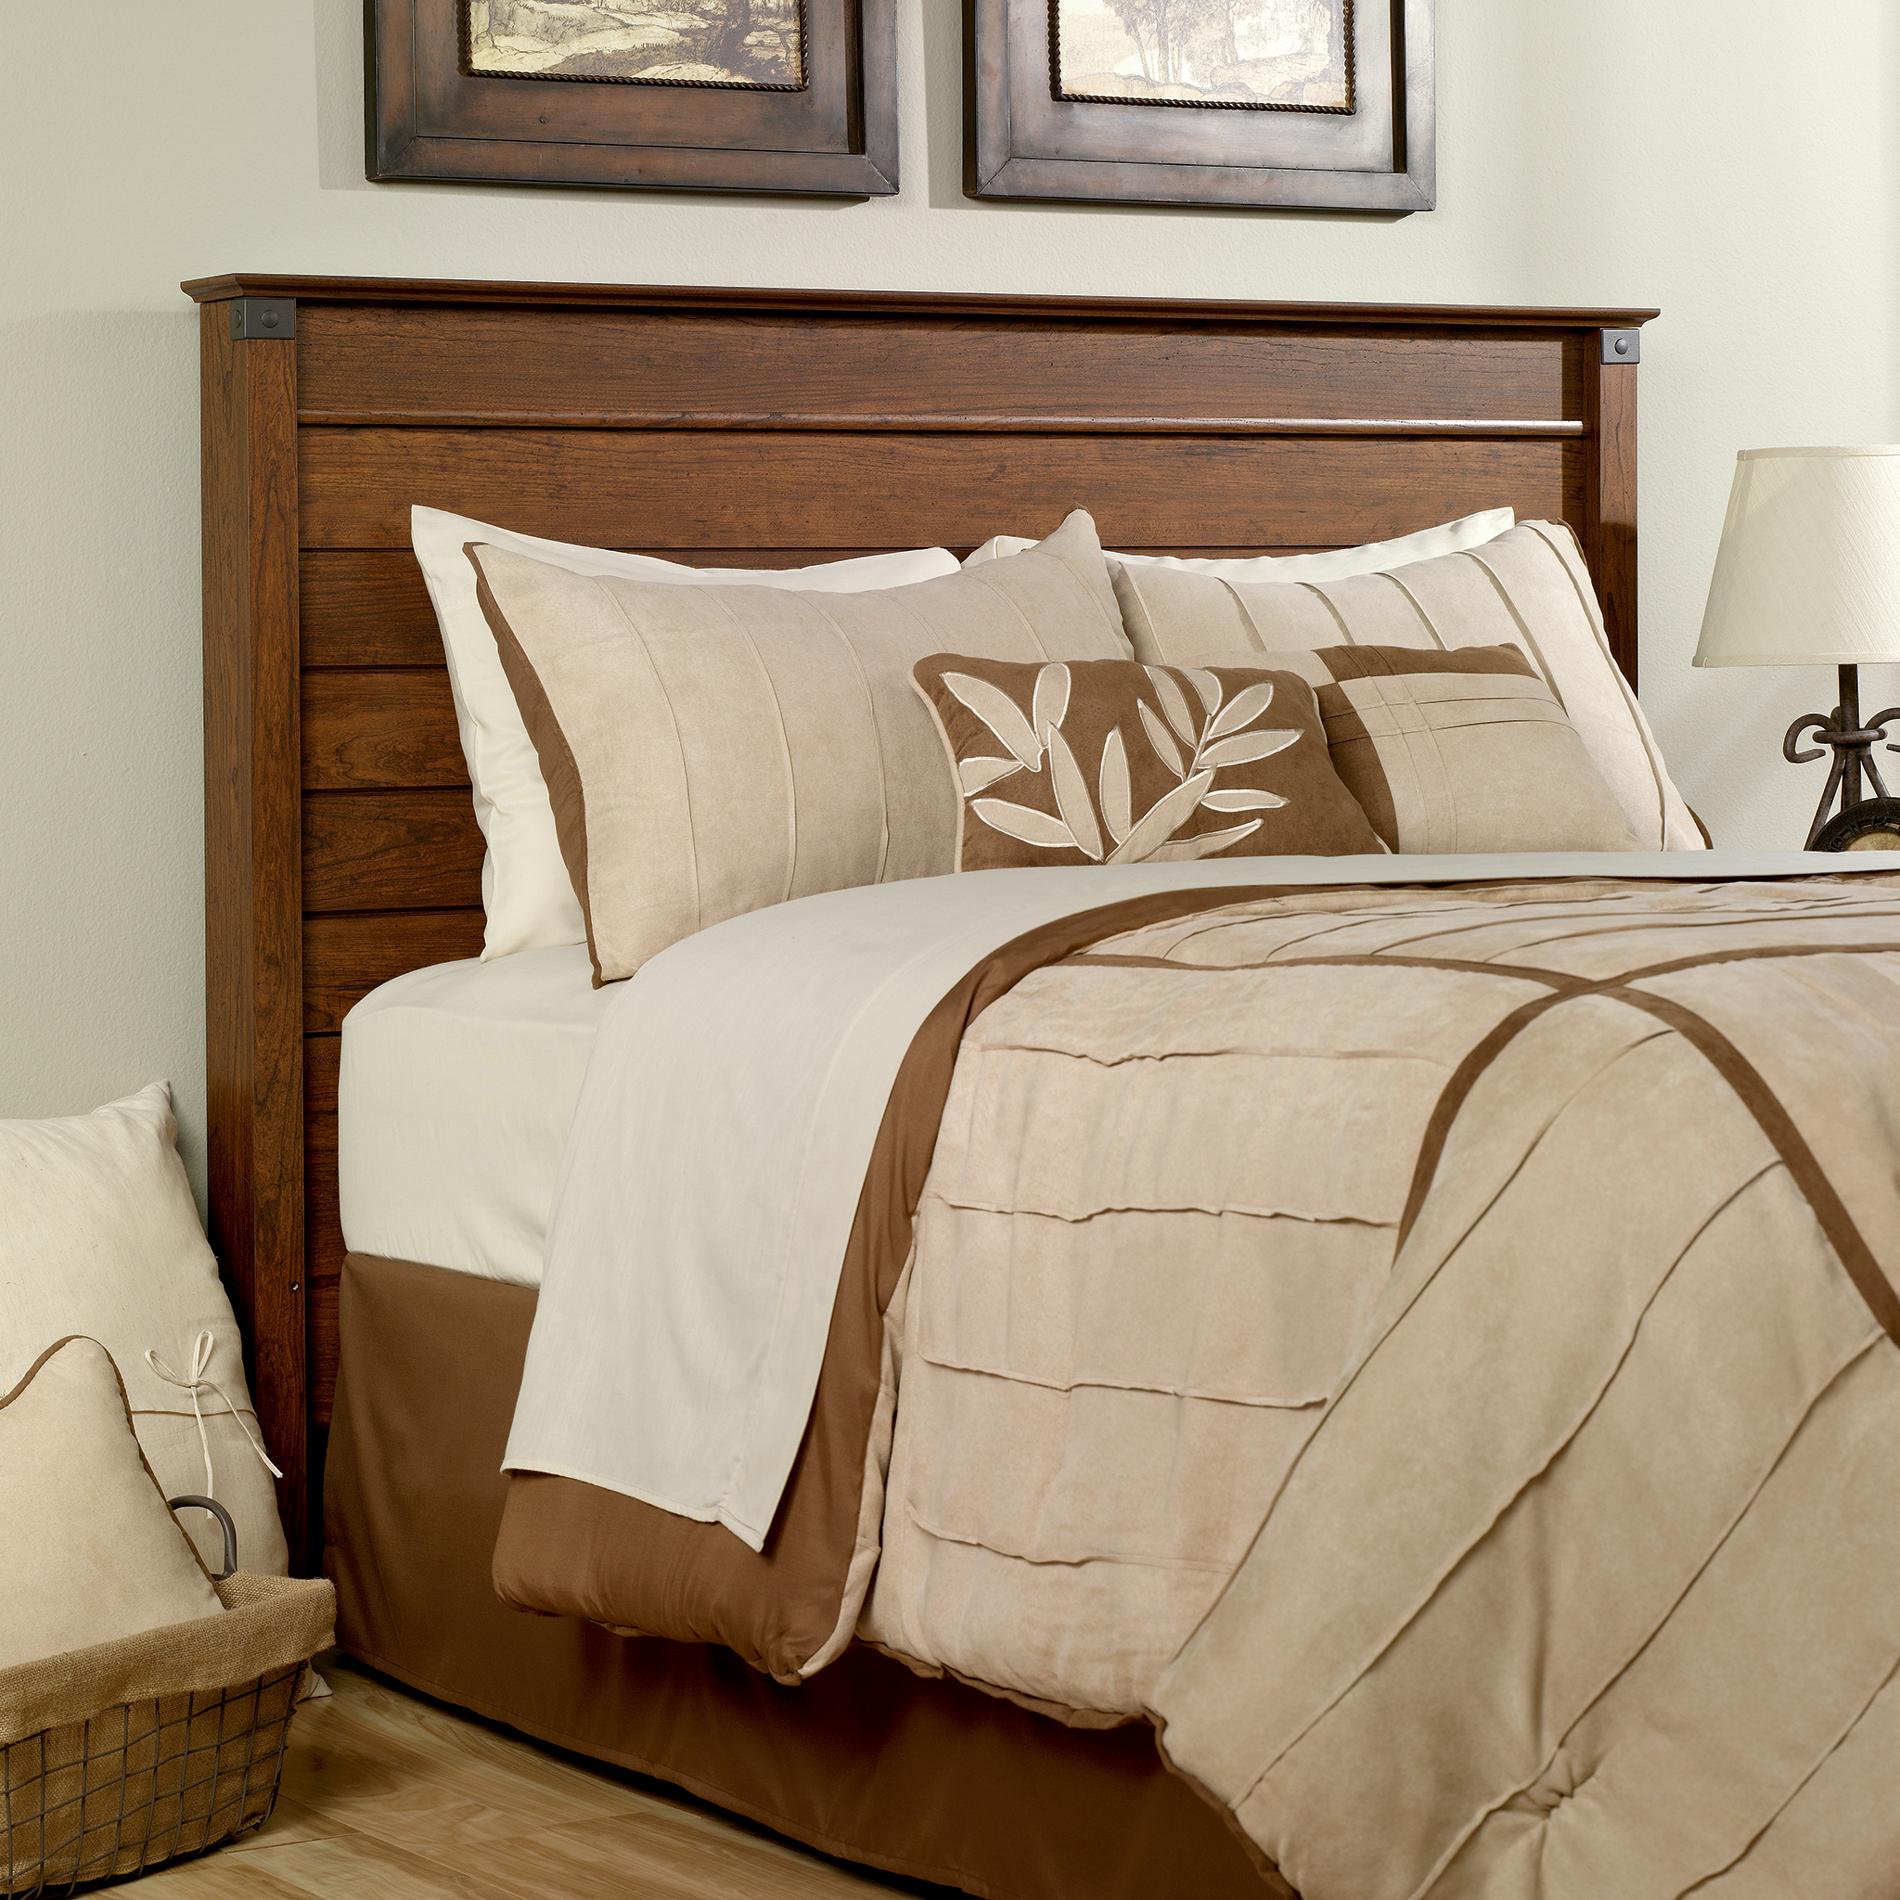 Bedroom Furniture Sets Sears Amazing Bedroom Living Room